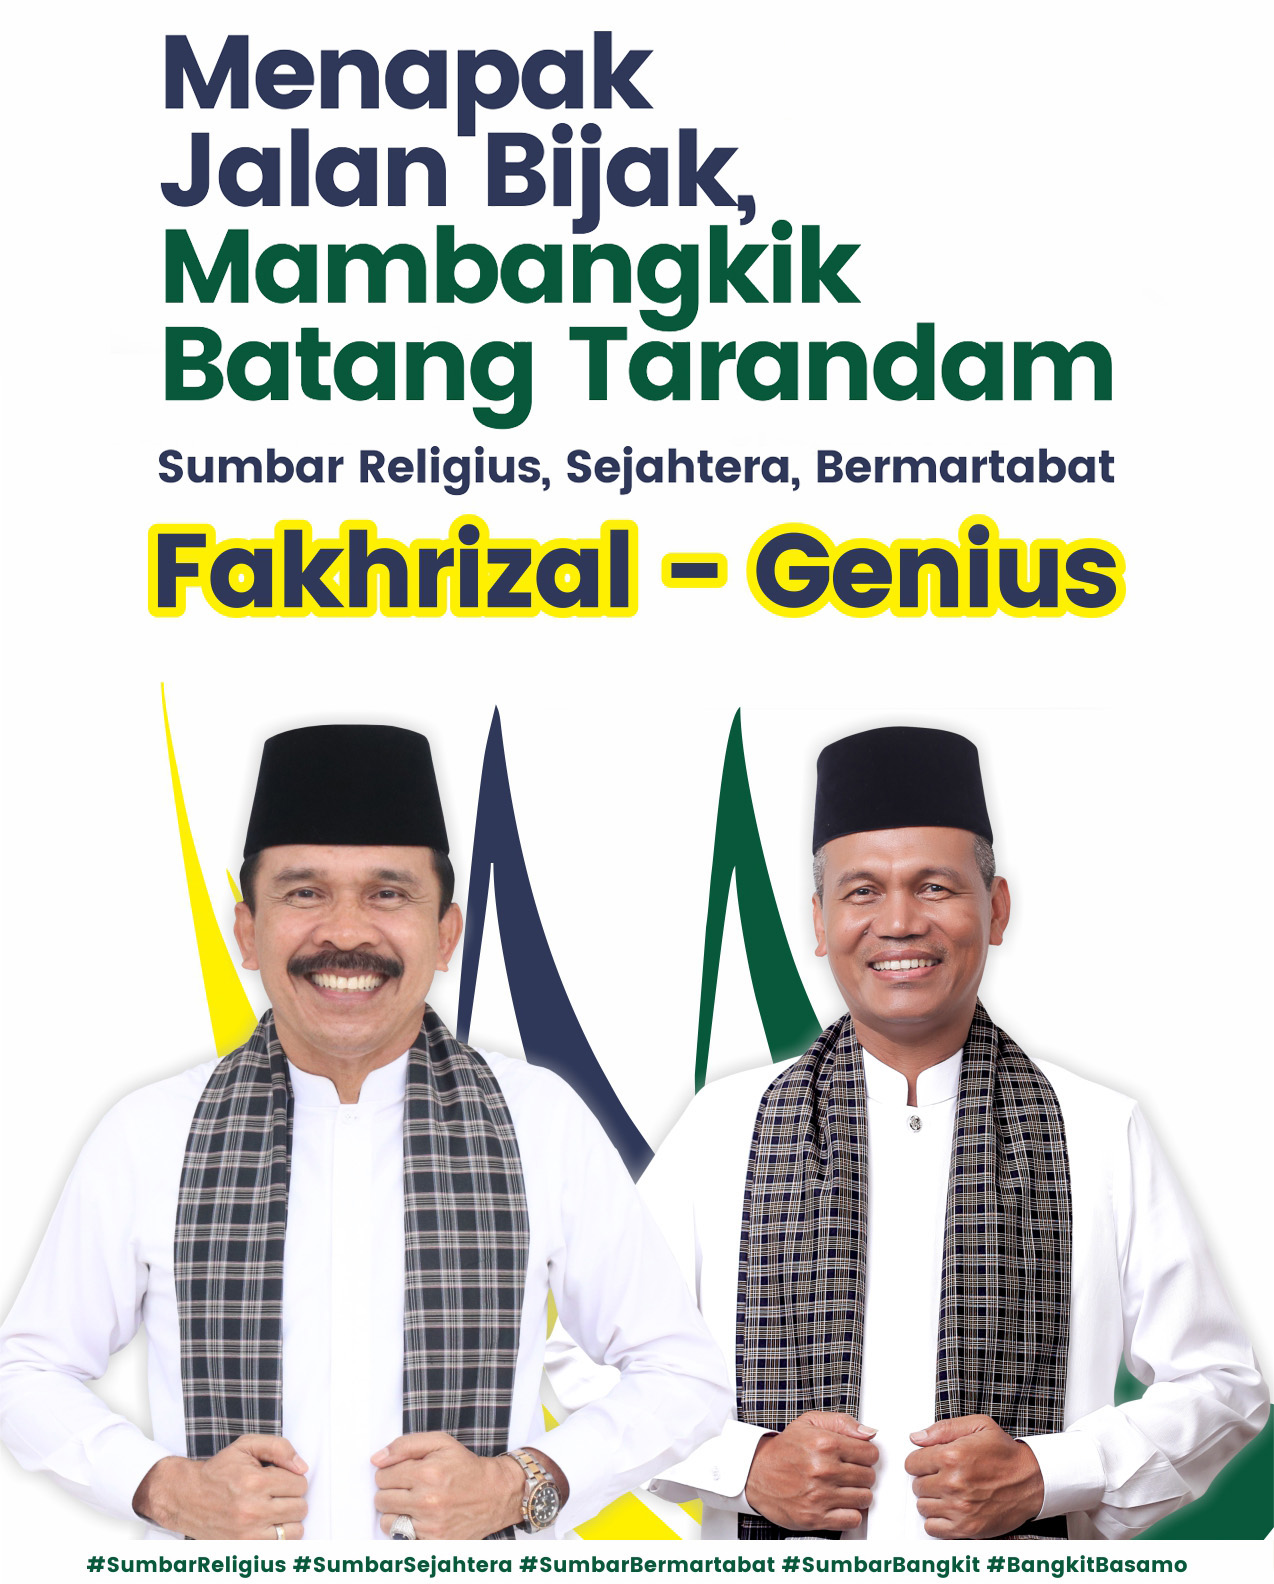 Fakhrizal - Genius PopUp-Mobile